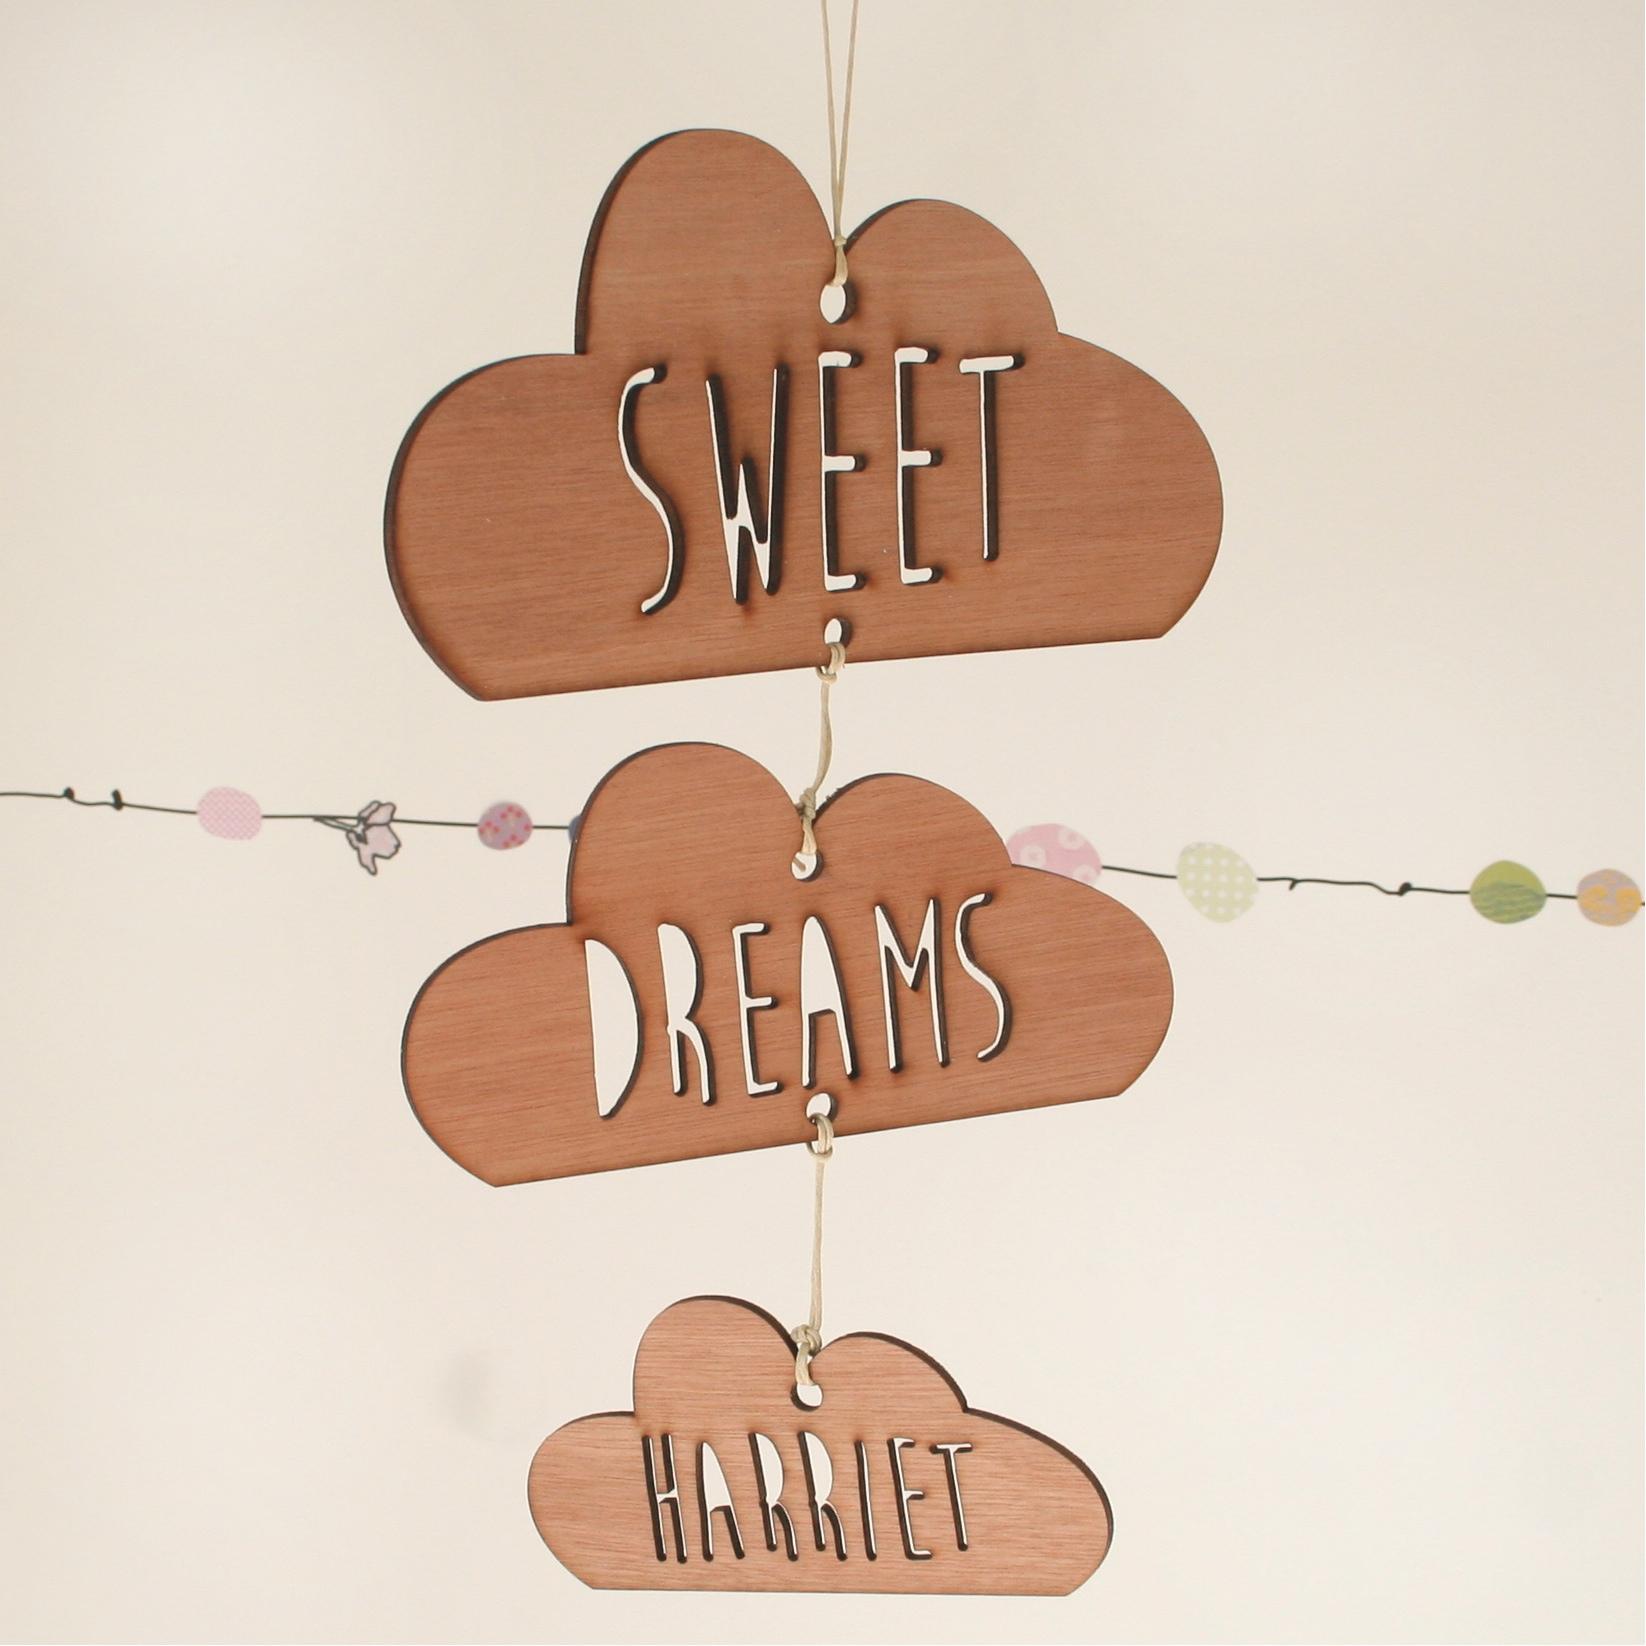 sweet dreams harriet triple.jpg